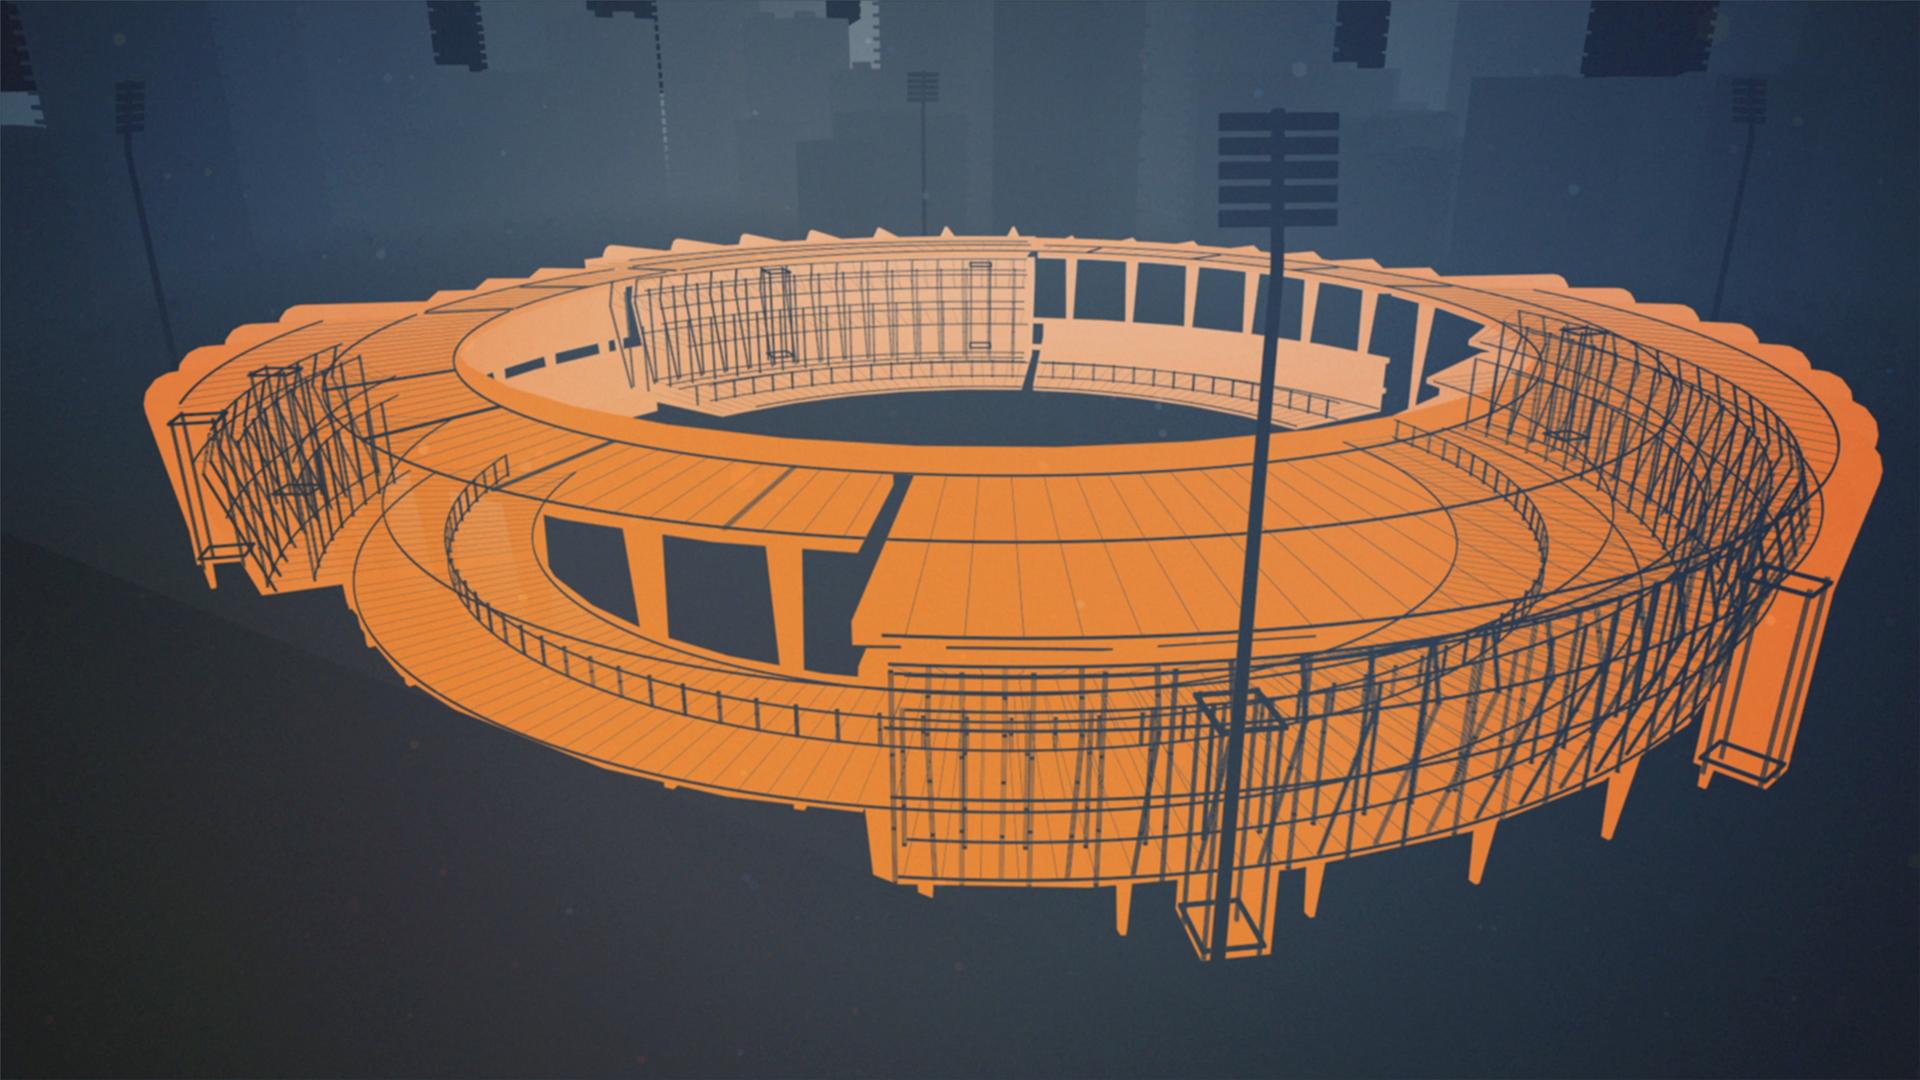 TMT_Stadion_PantherVision